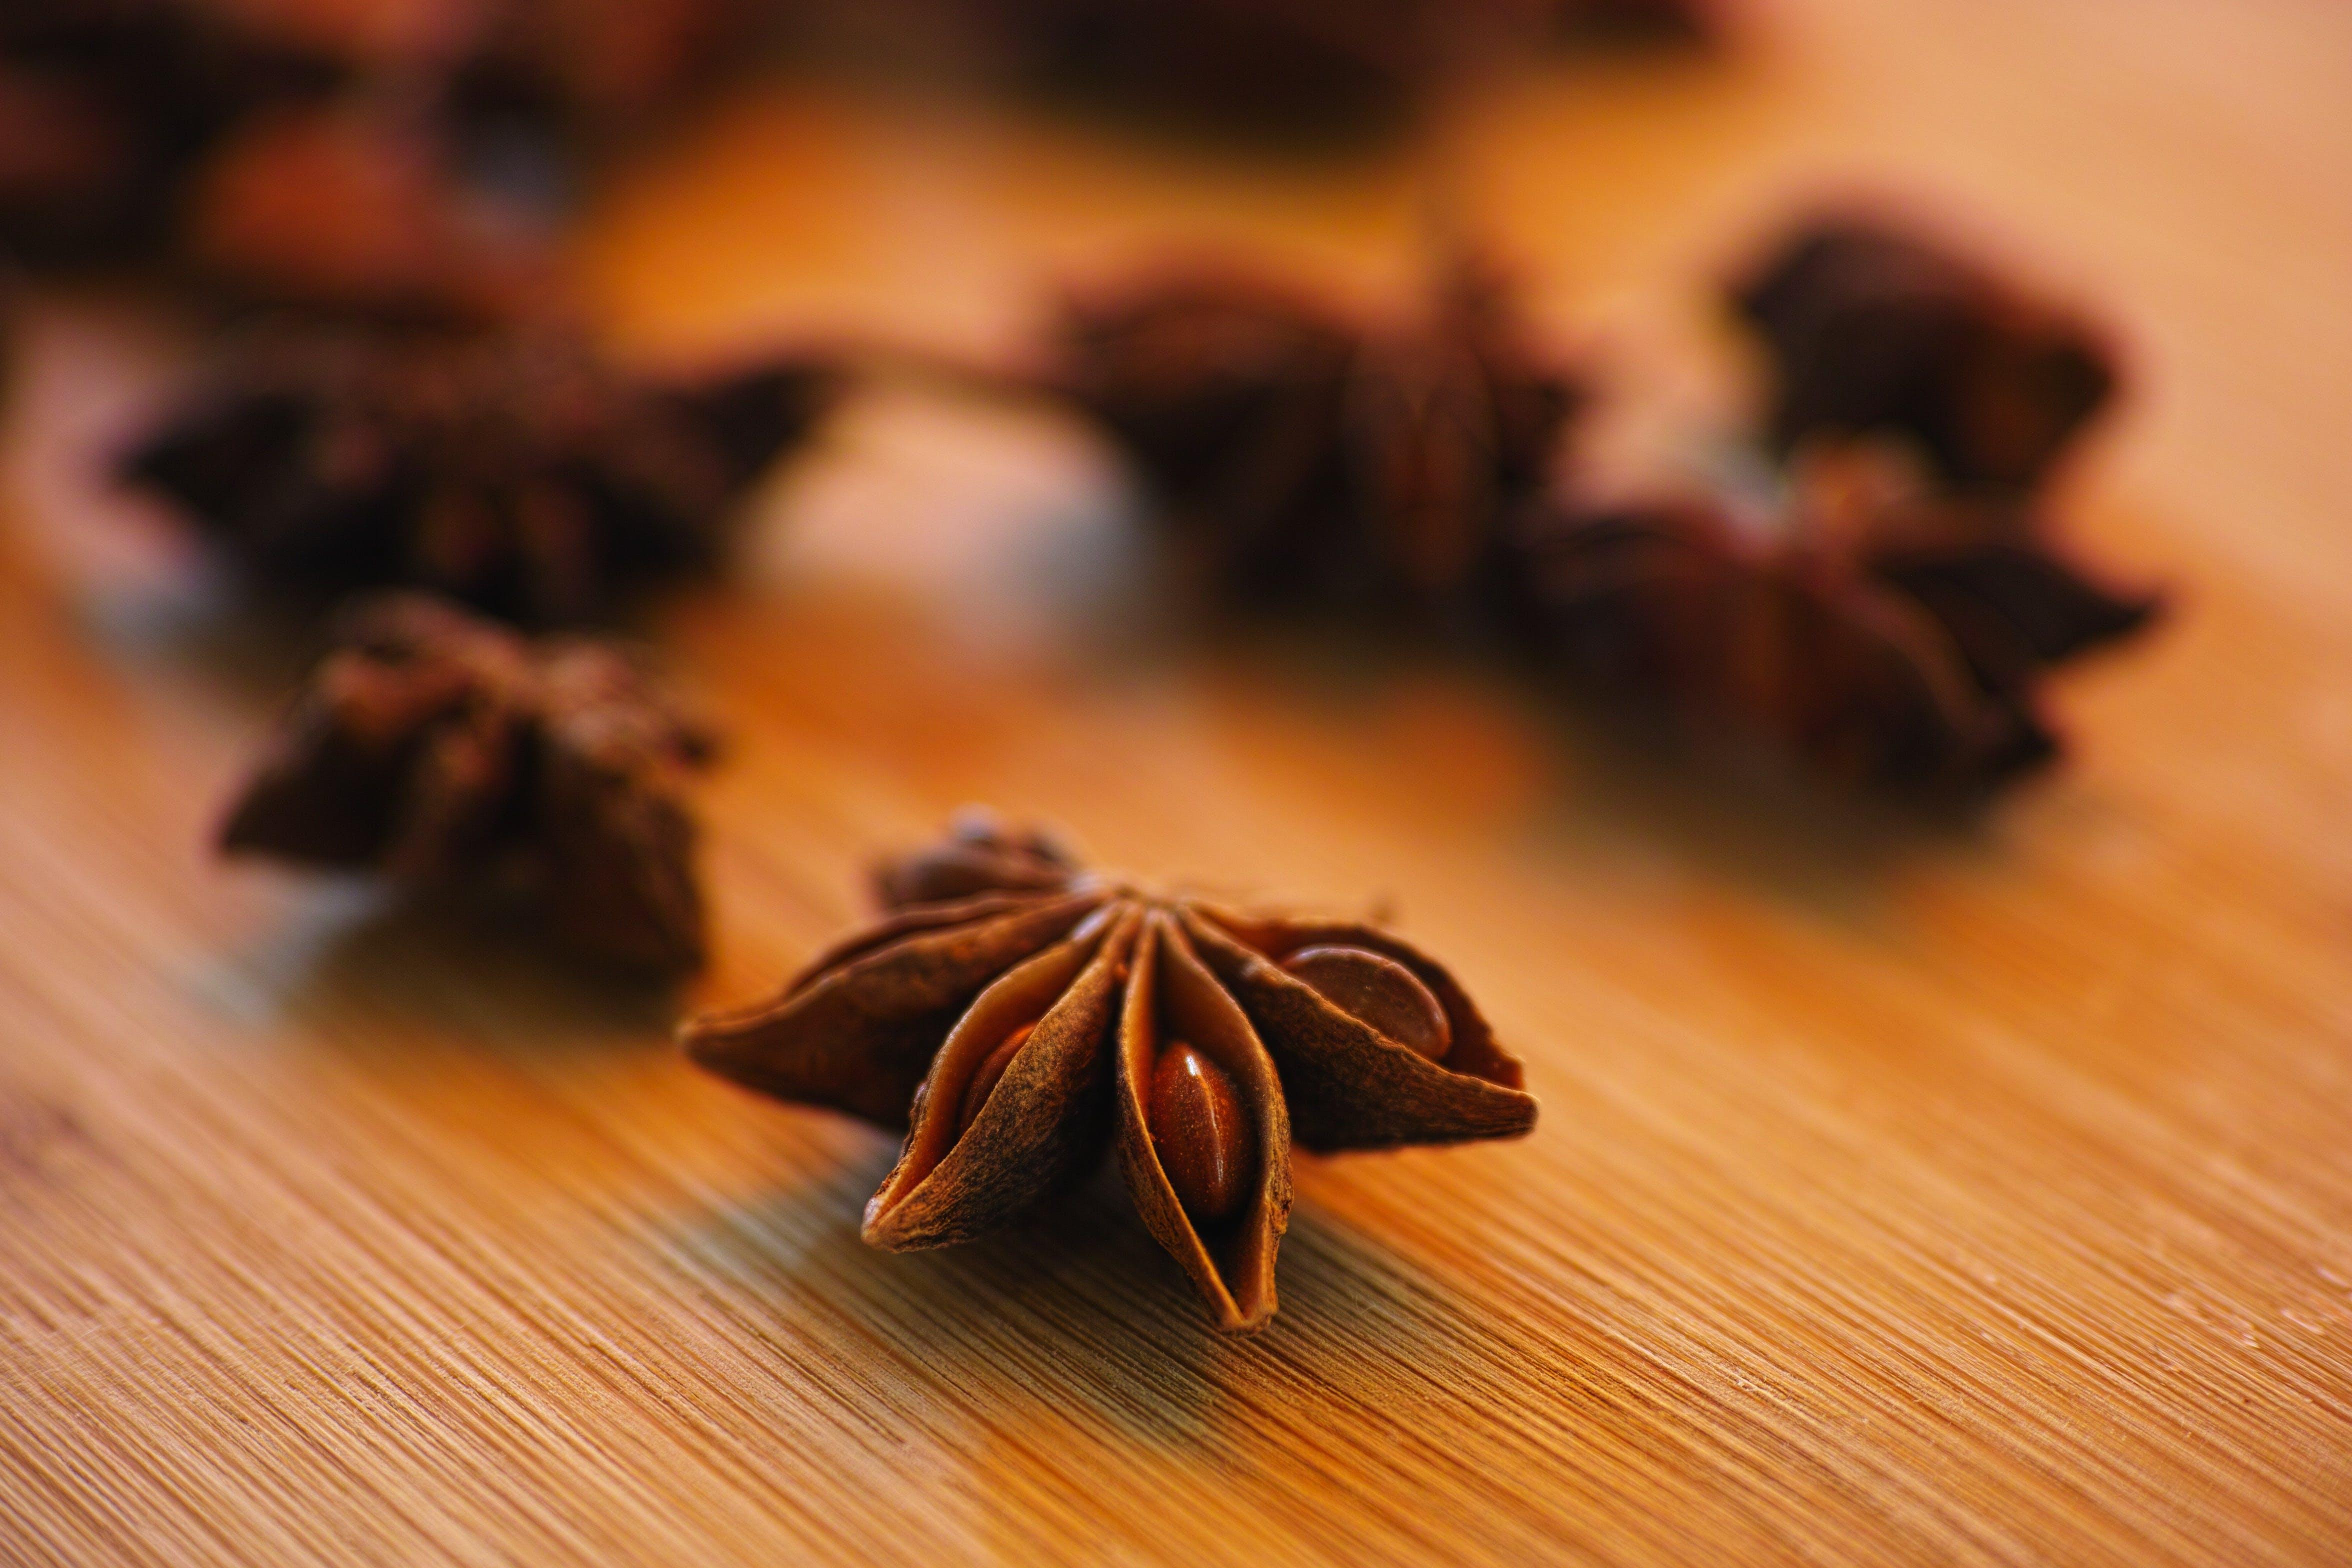 anise, aroma, aromatic